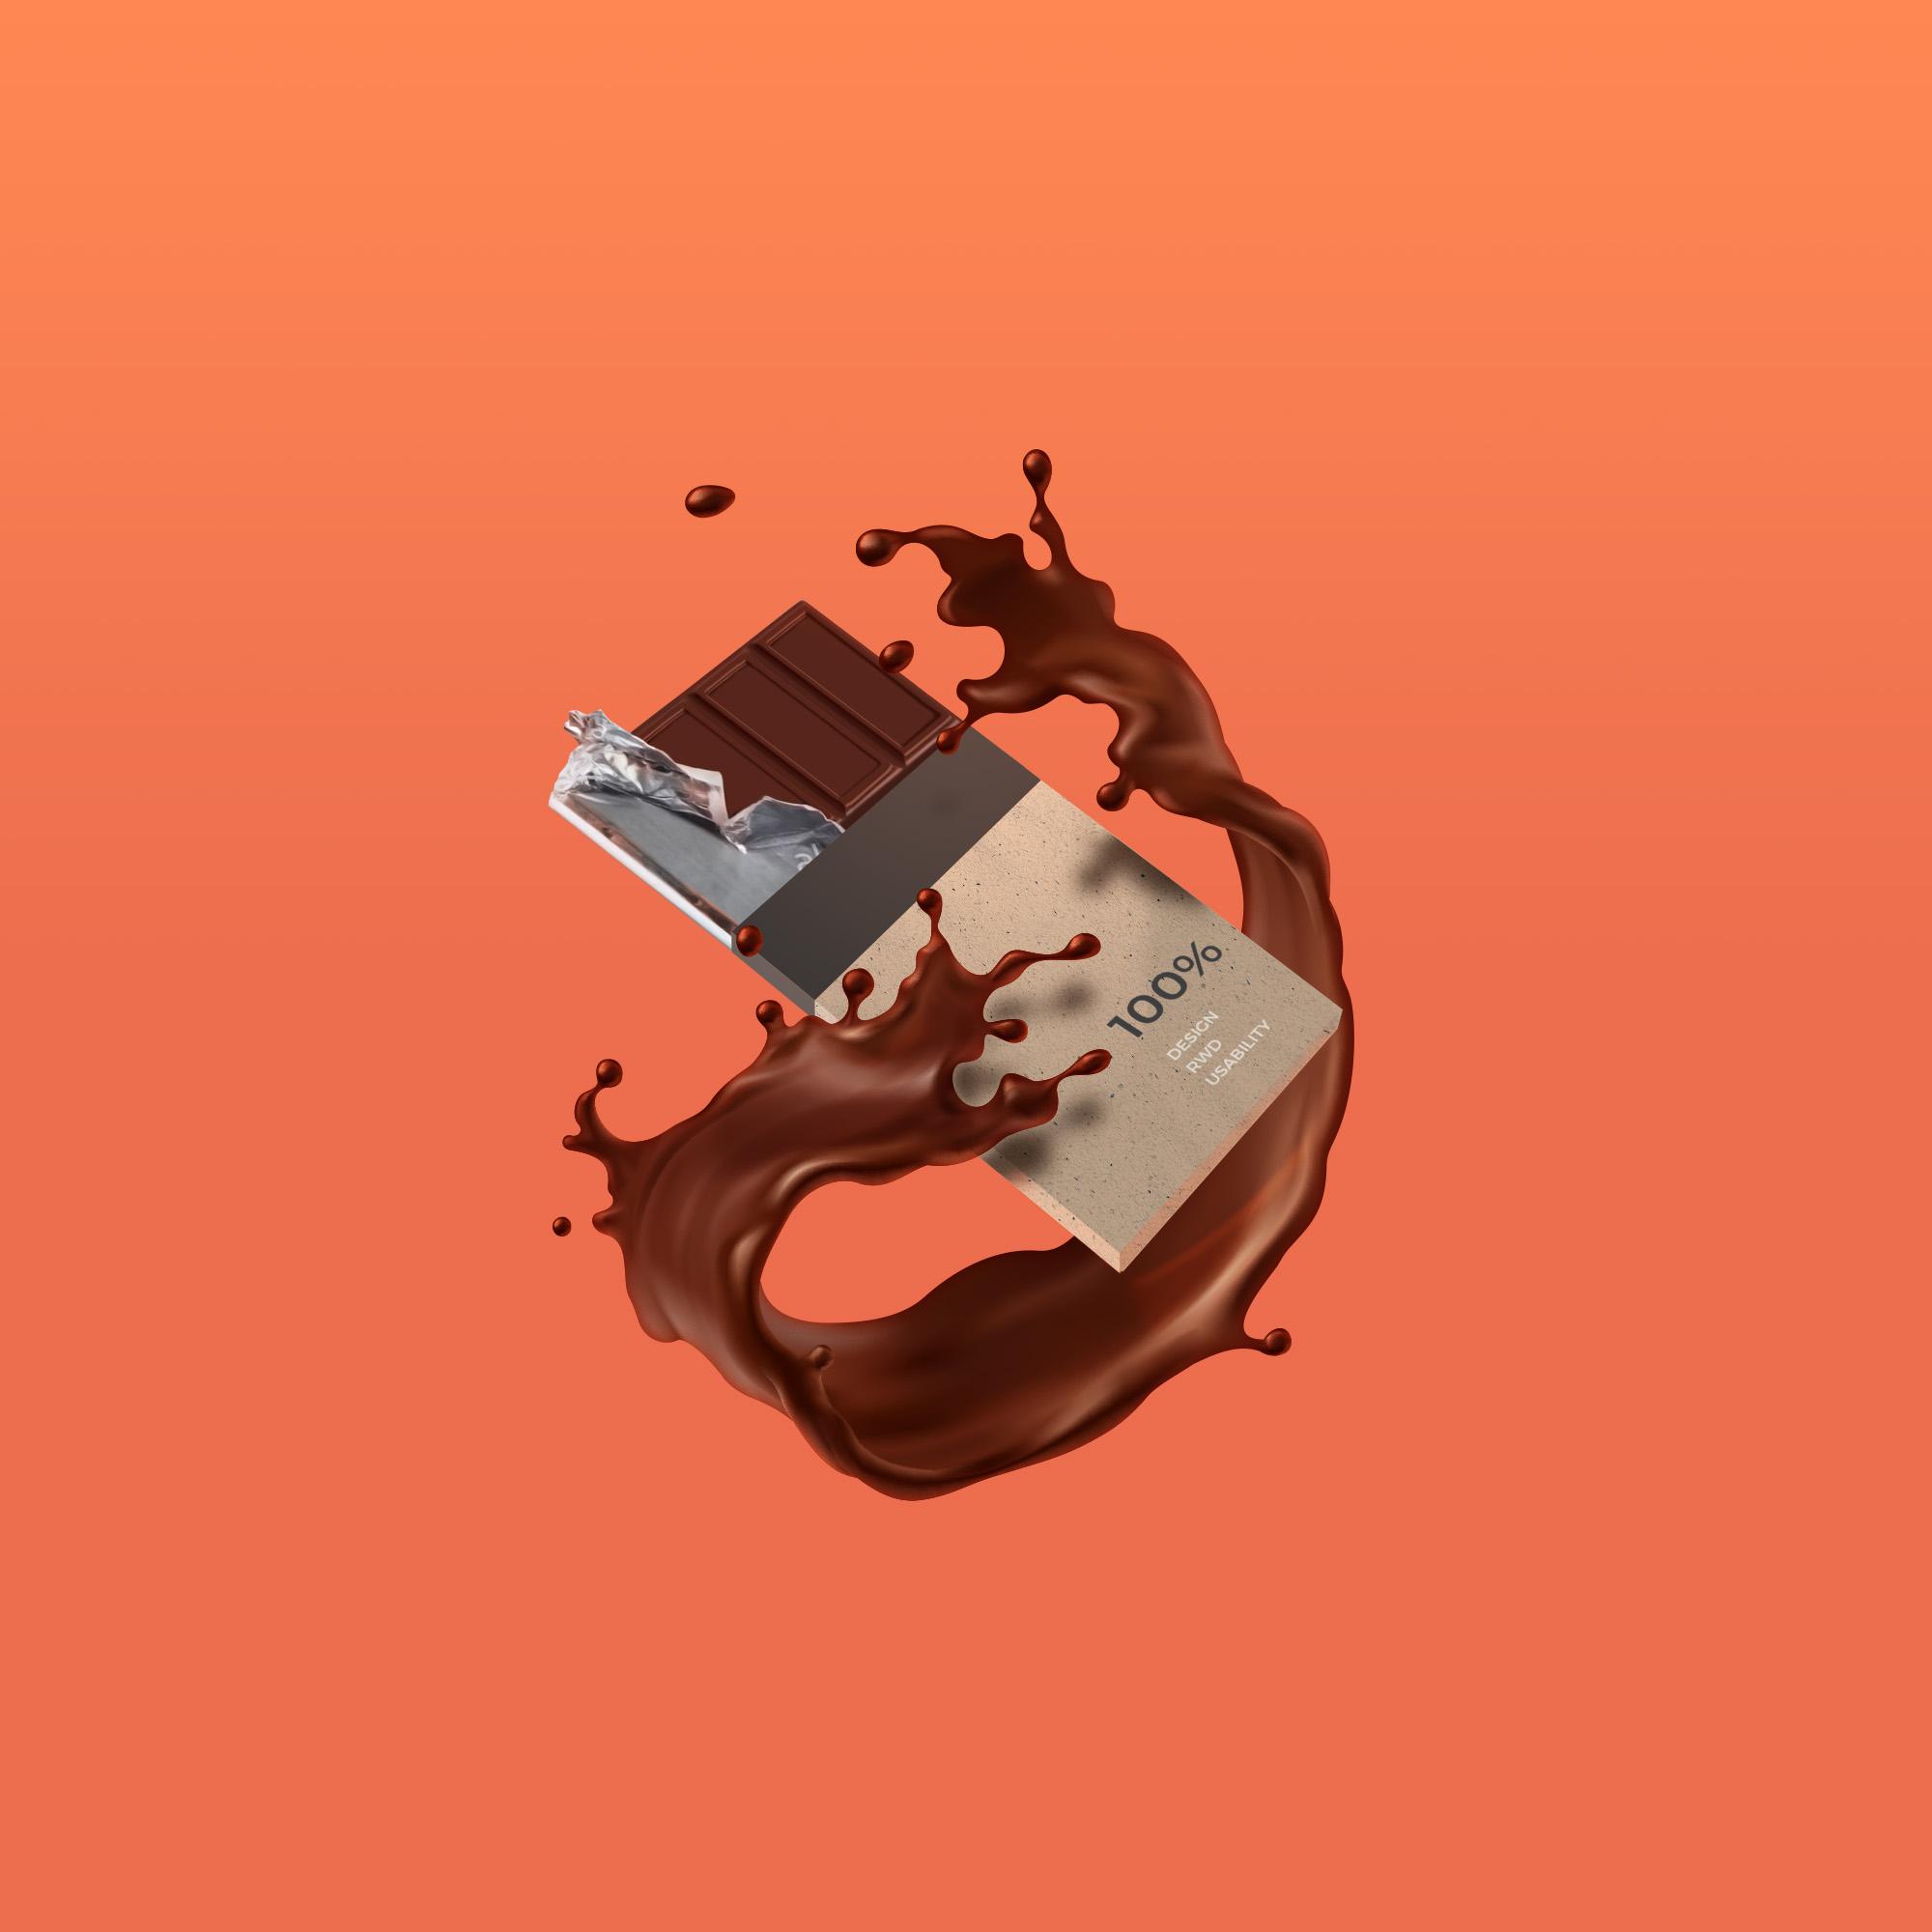 Strony internetowe - web design & development, art designer - Ireneusz Bloch, ibernet